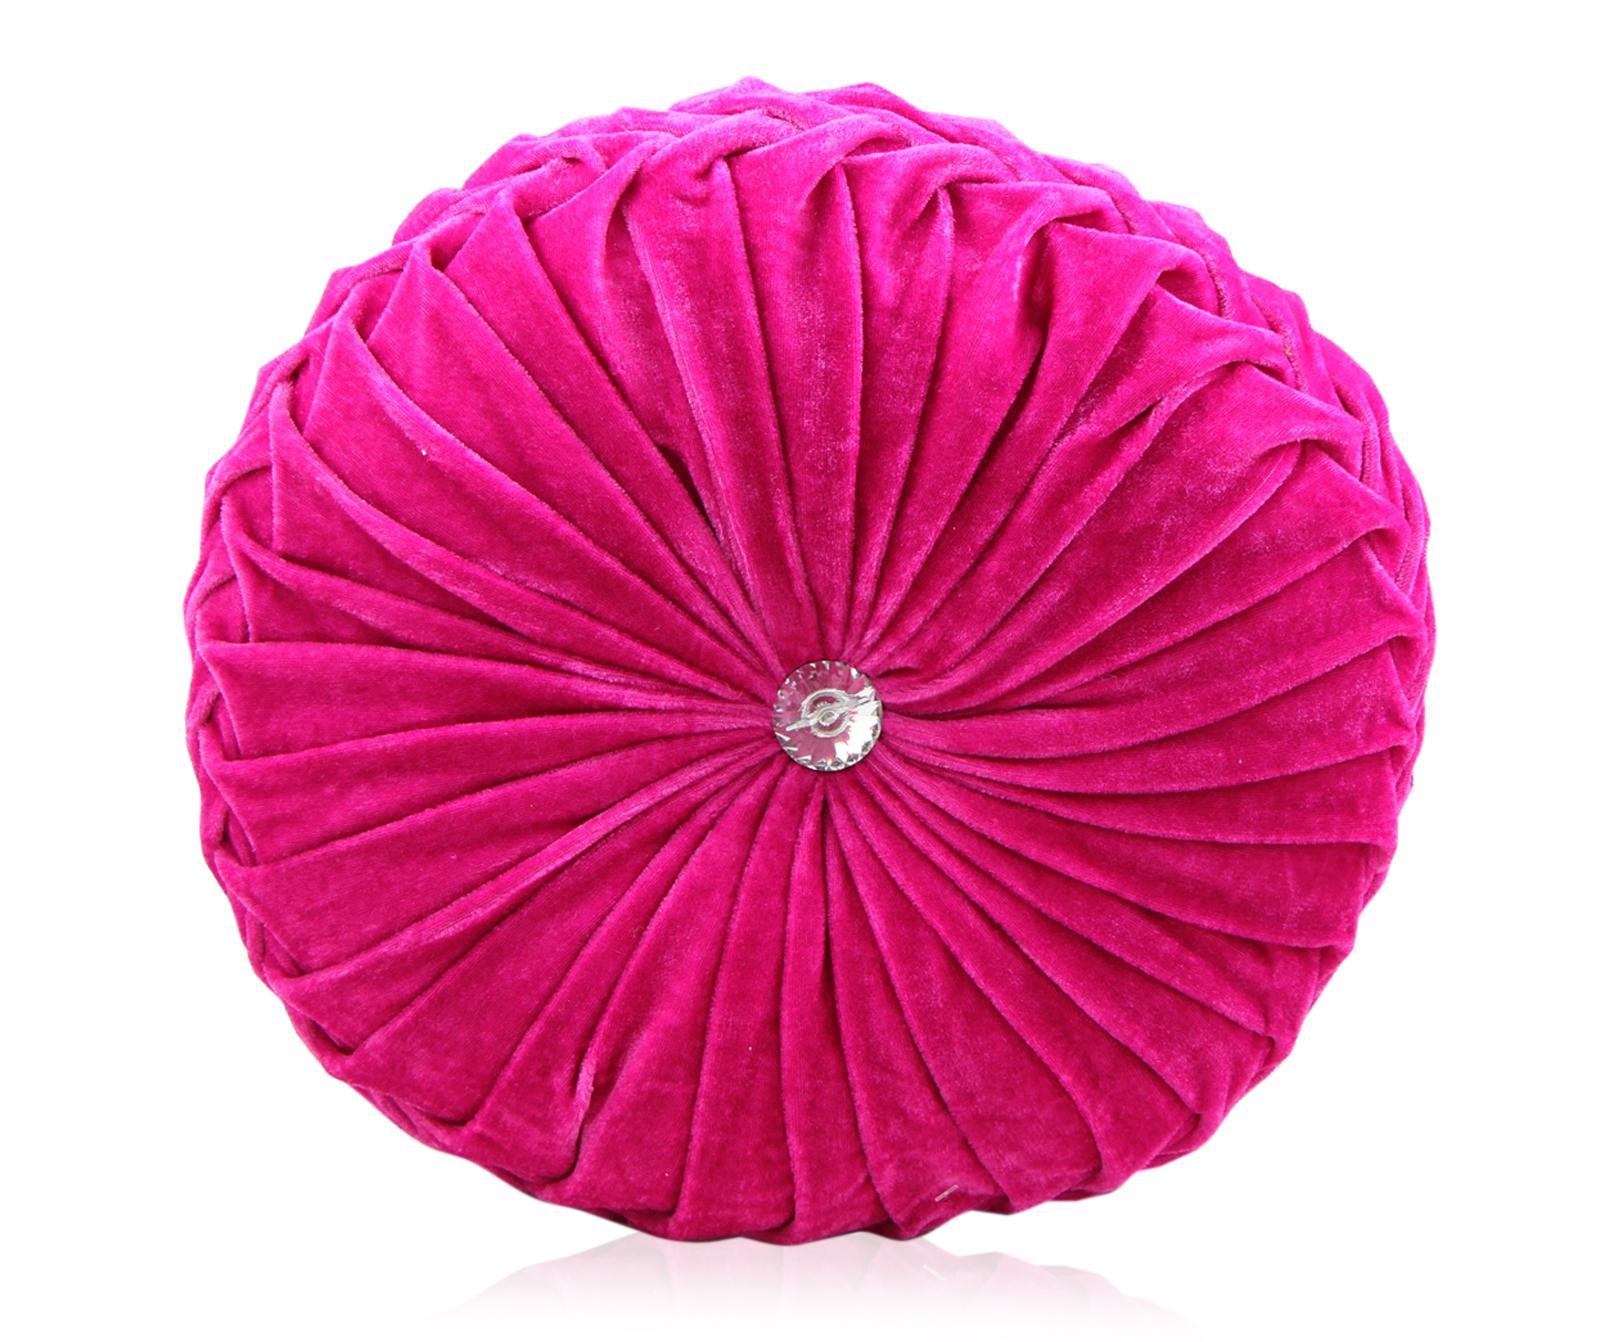 Round Velvet Cushions Purple Pink Luxury Diamante Chic  : diamond diamond cerise from www.ebay.com size 1600 x 1342 jpeg 1180kB